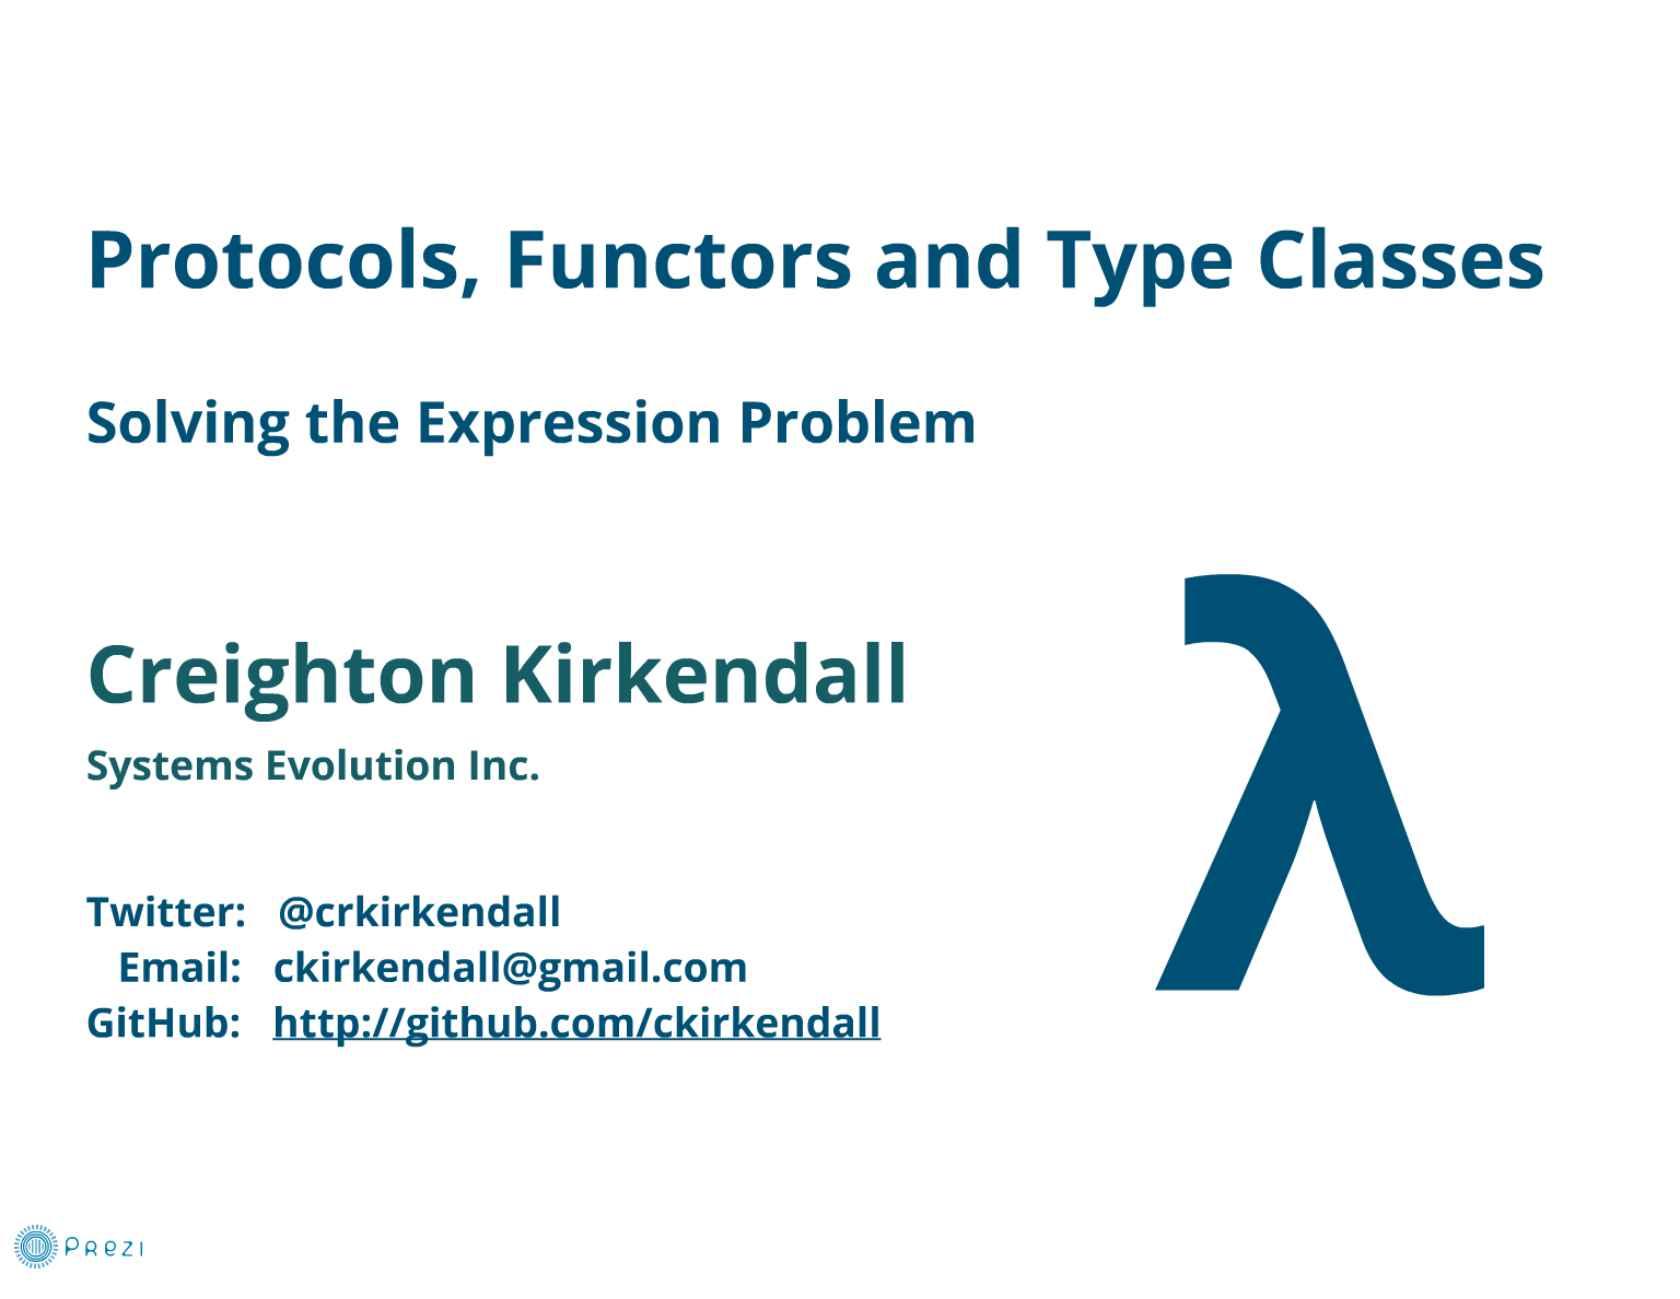 Protocols, Functors and Type Classes